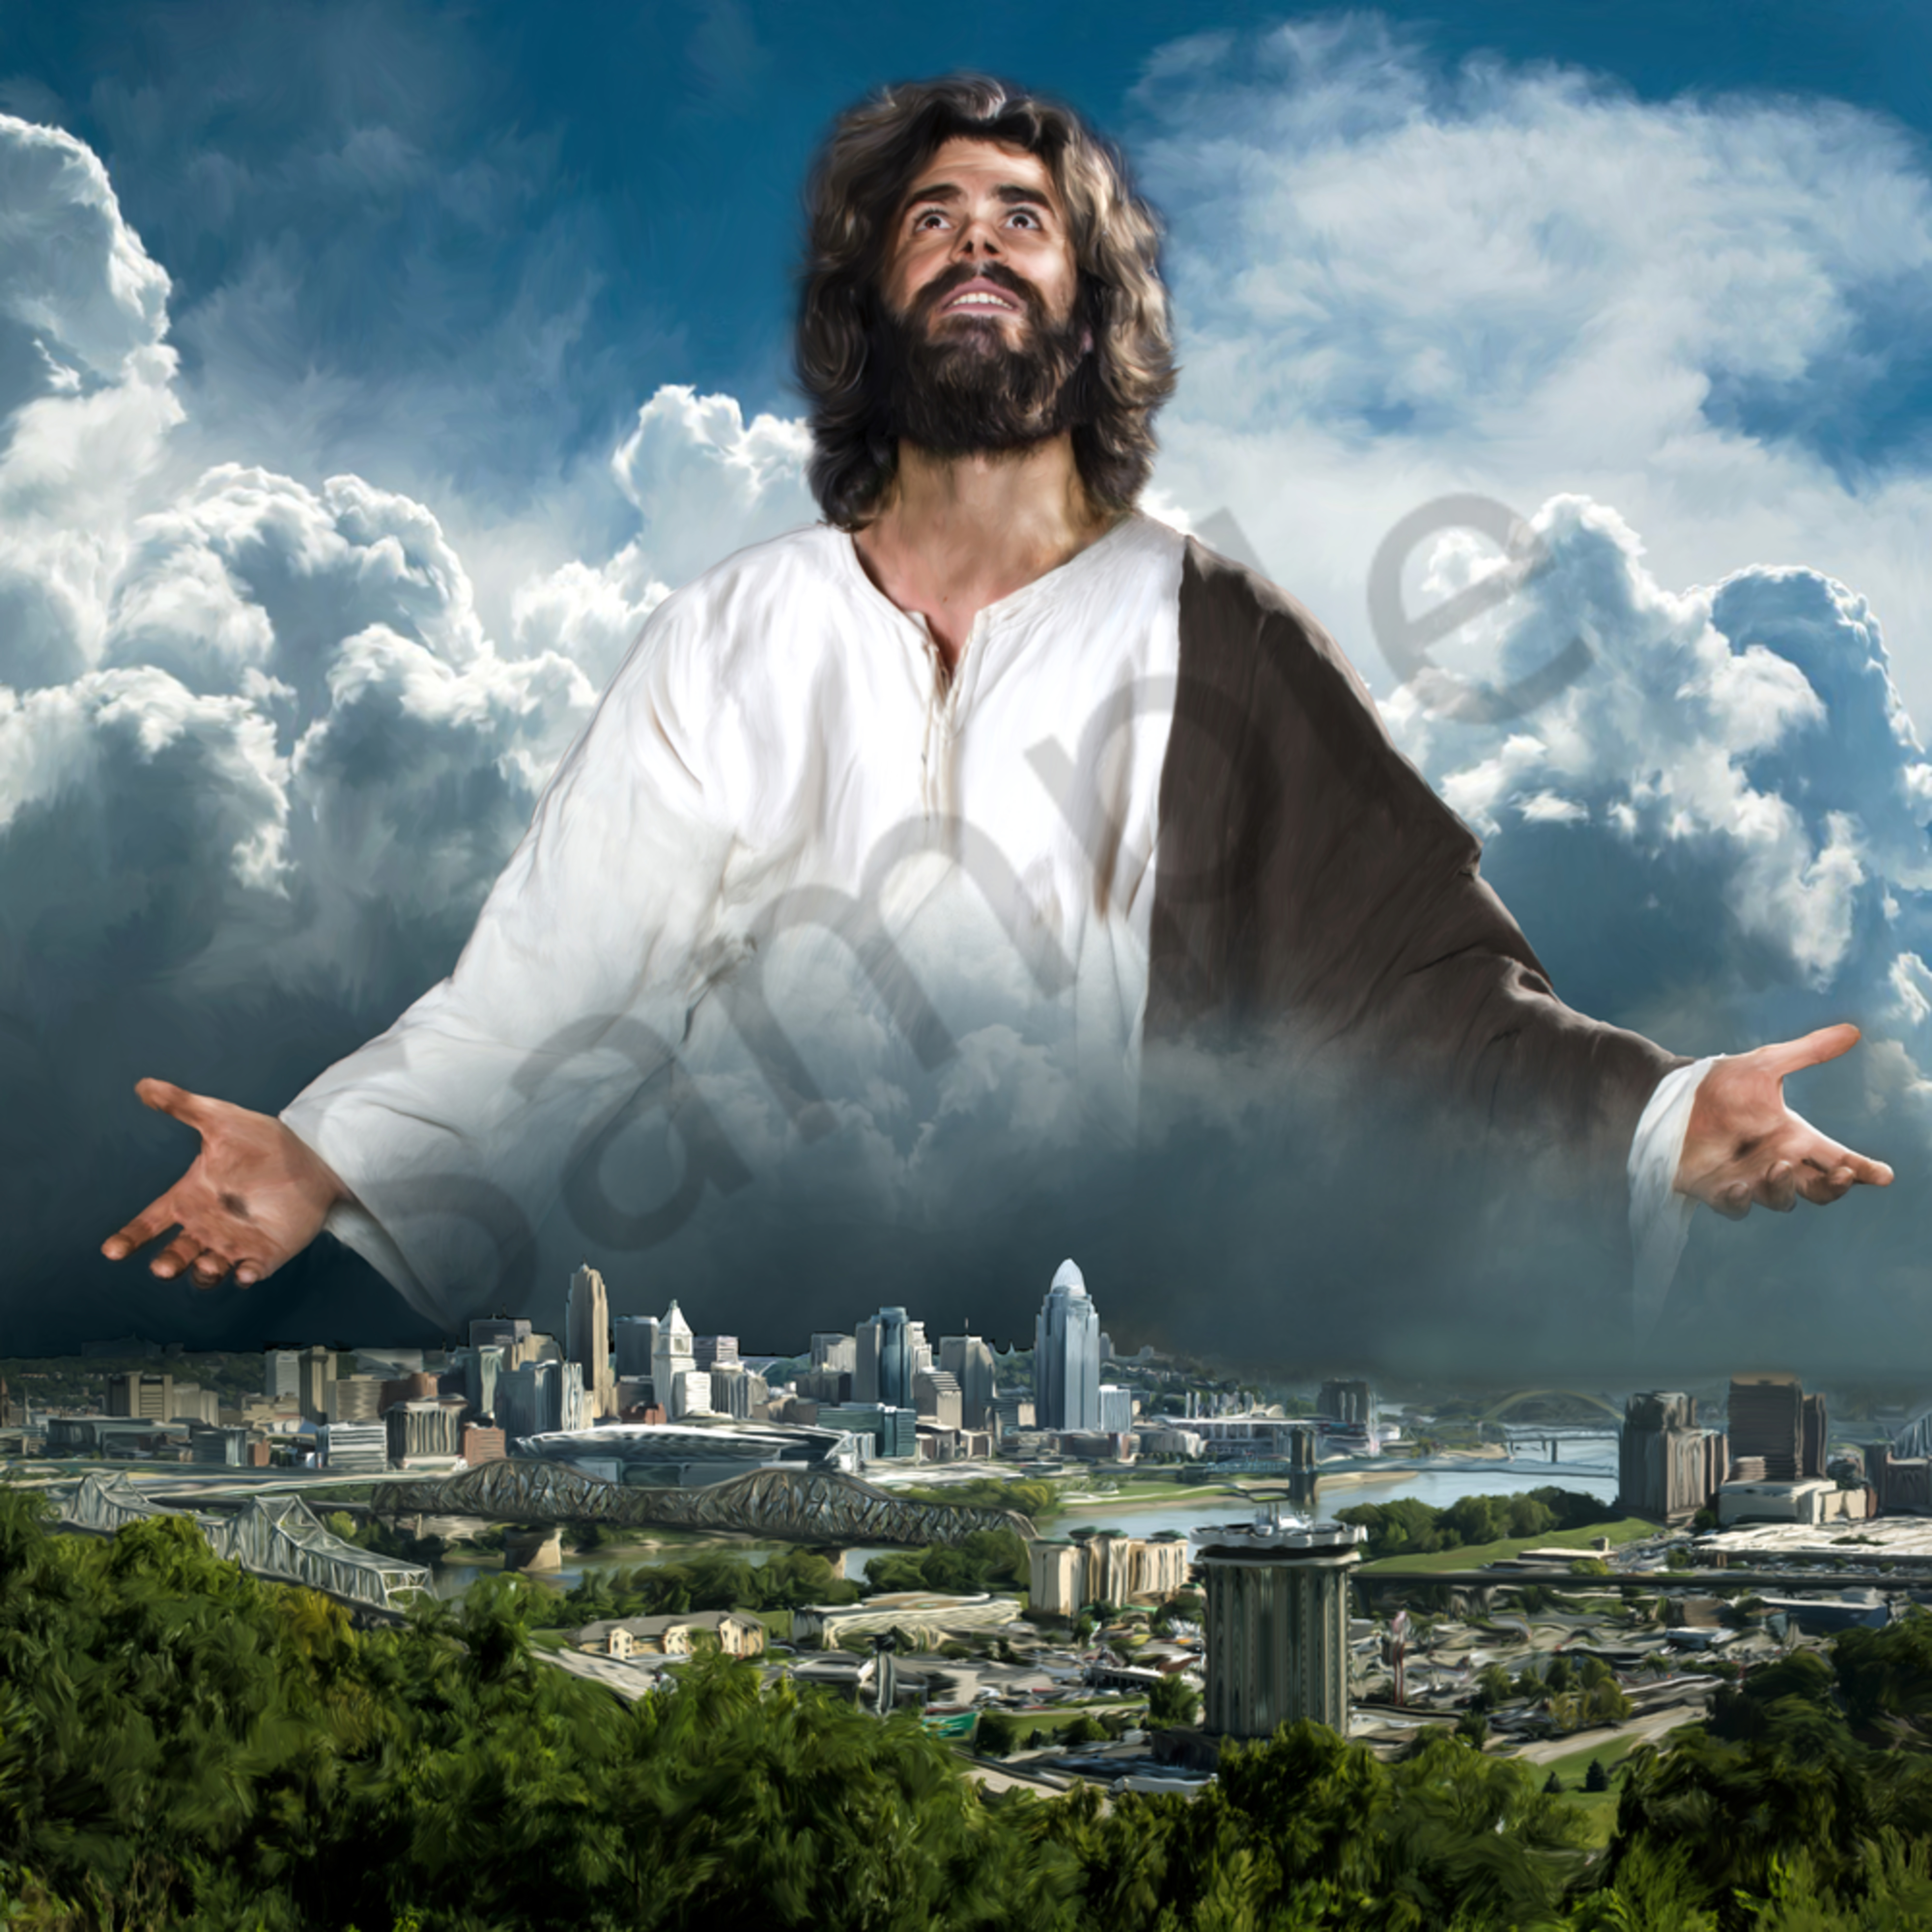 Jesus of the city 2 dkuyzh